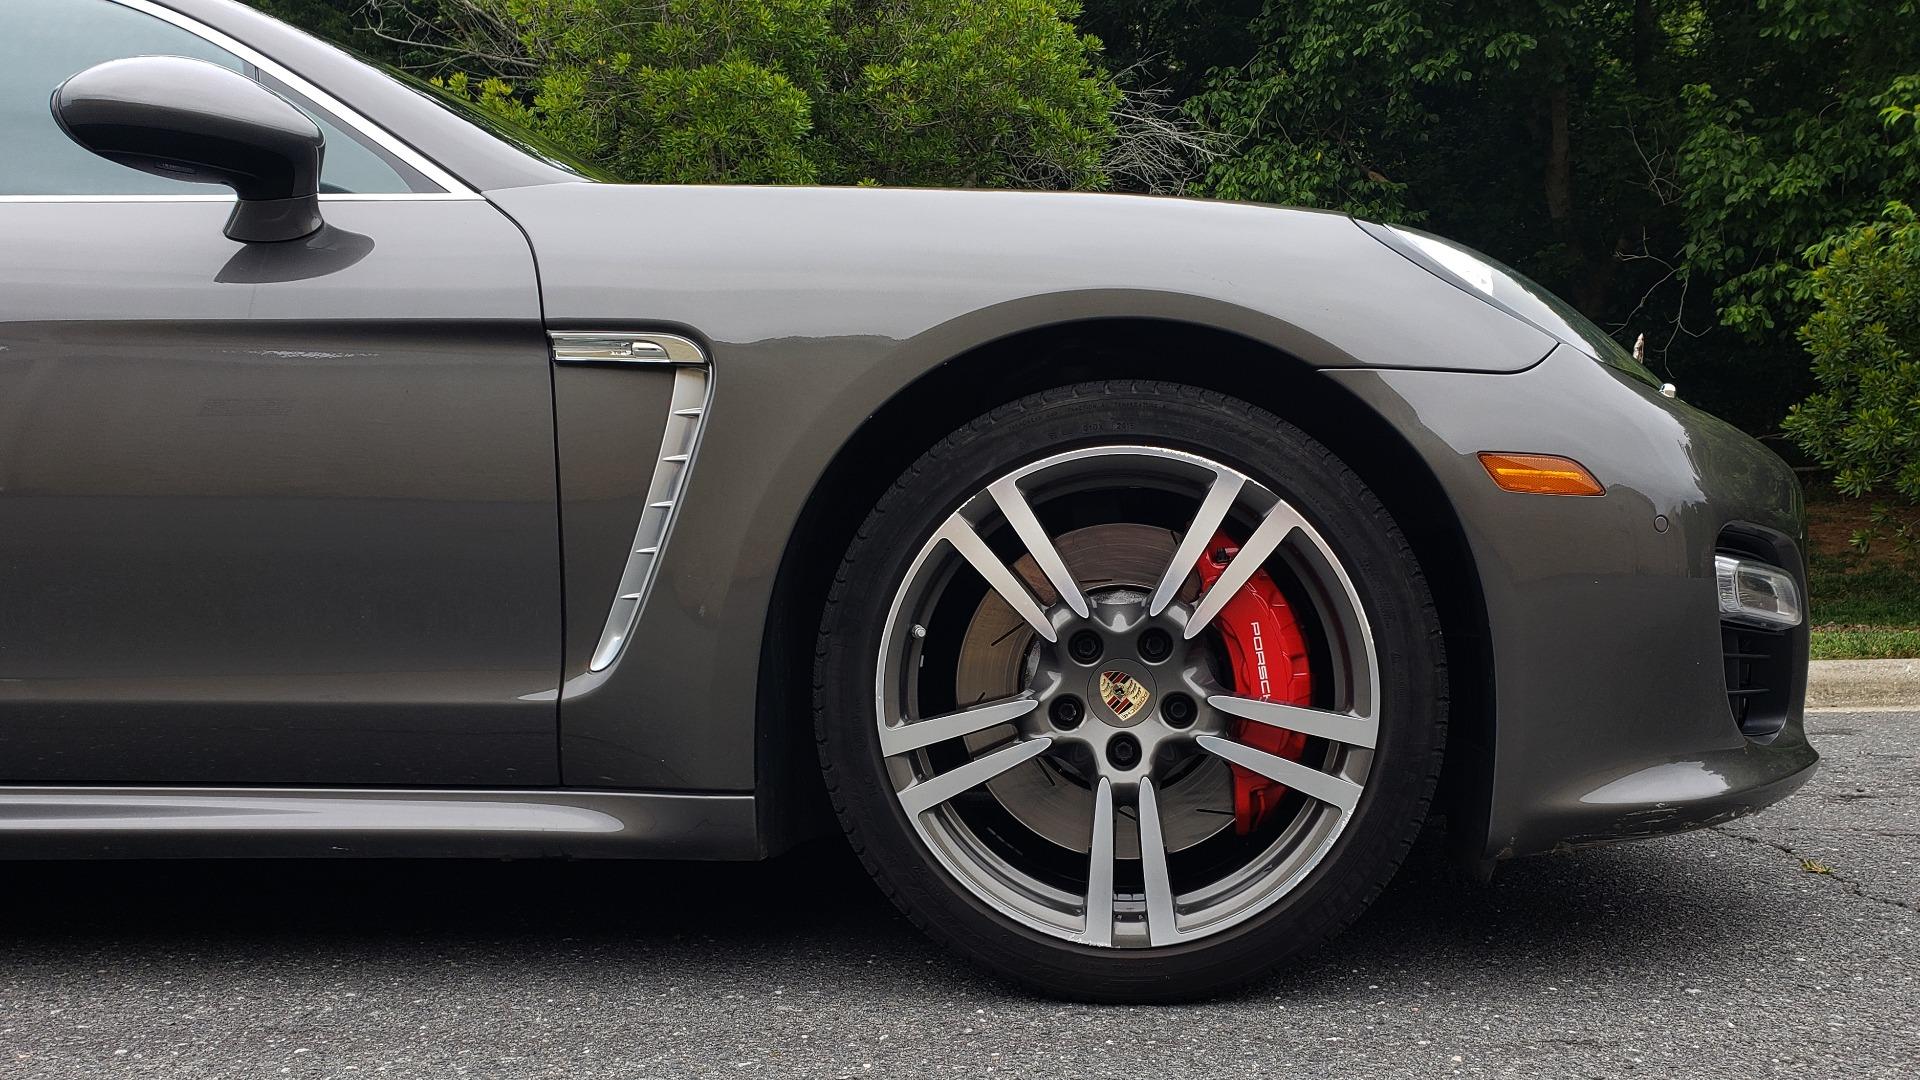 Used 2013 Porsche PANAMERA TURBO 4.8L V8 / AWD / NAV / SUNROOF / LCA / PARK ASST / BURMESTER for sale $45,995 at Formula Imports in Charlotte NC 28227 91